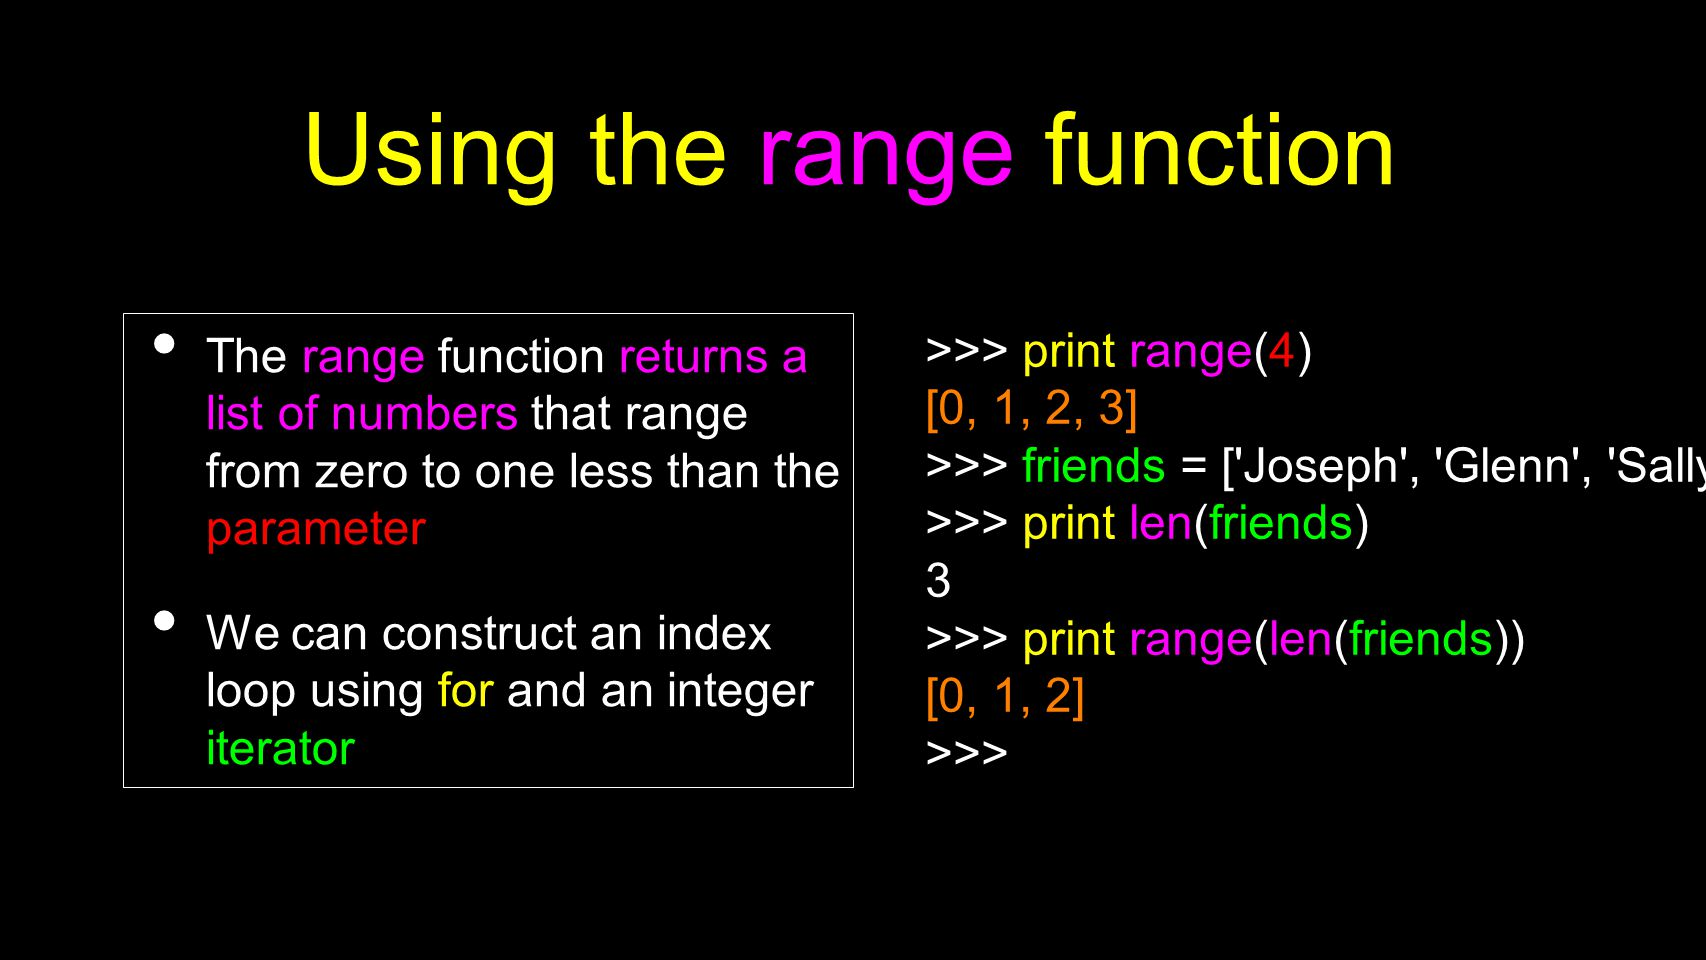 Using the range function